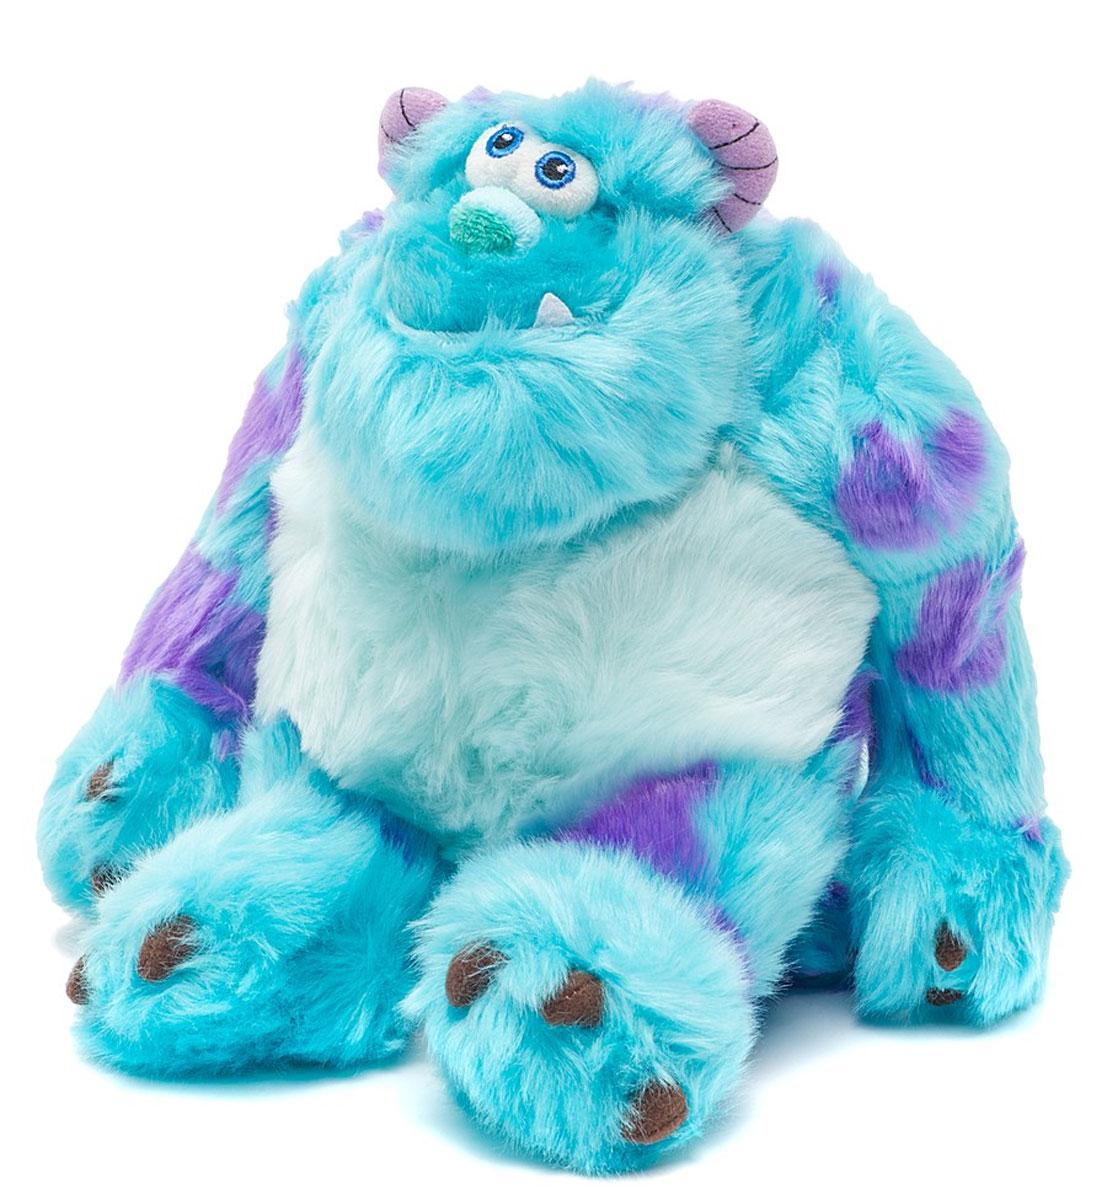 Disney Мягкая озвученная игрушка Монстр Салли 20 см игрушка arctic force sling shot монстр sb38287